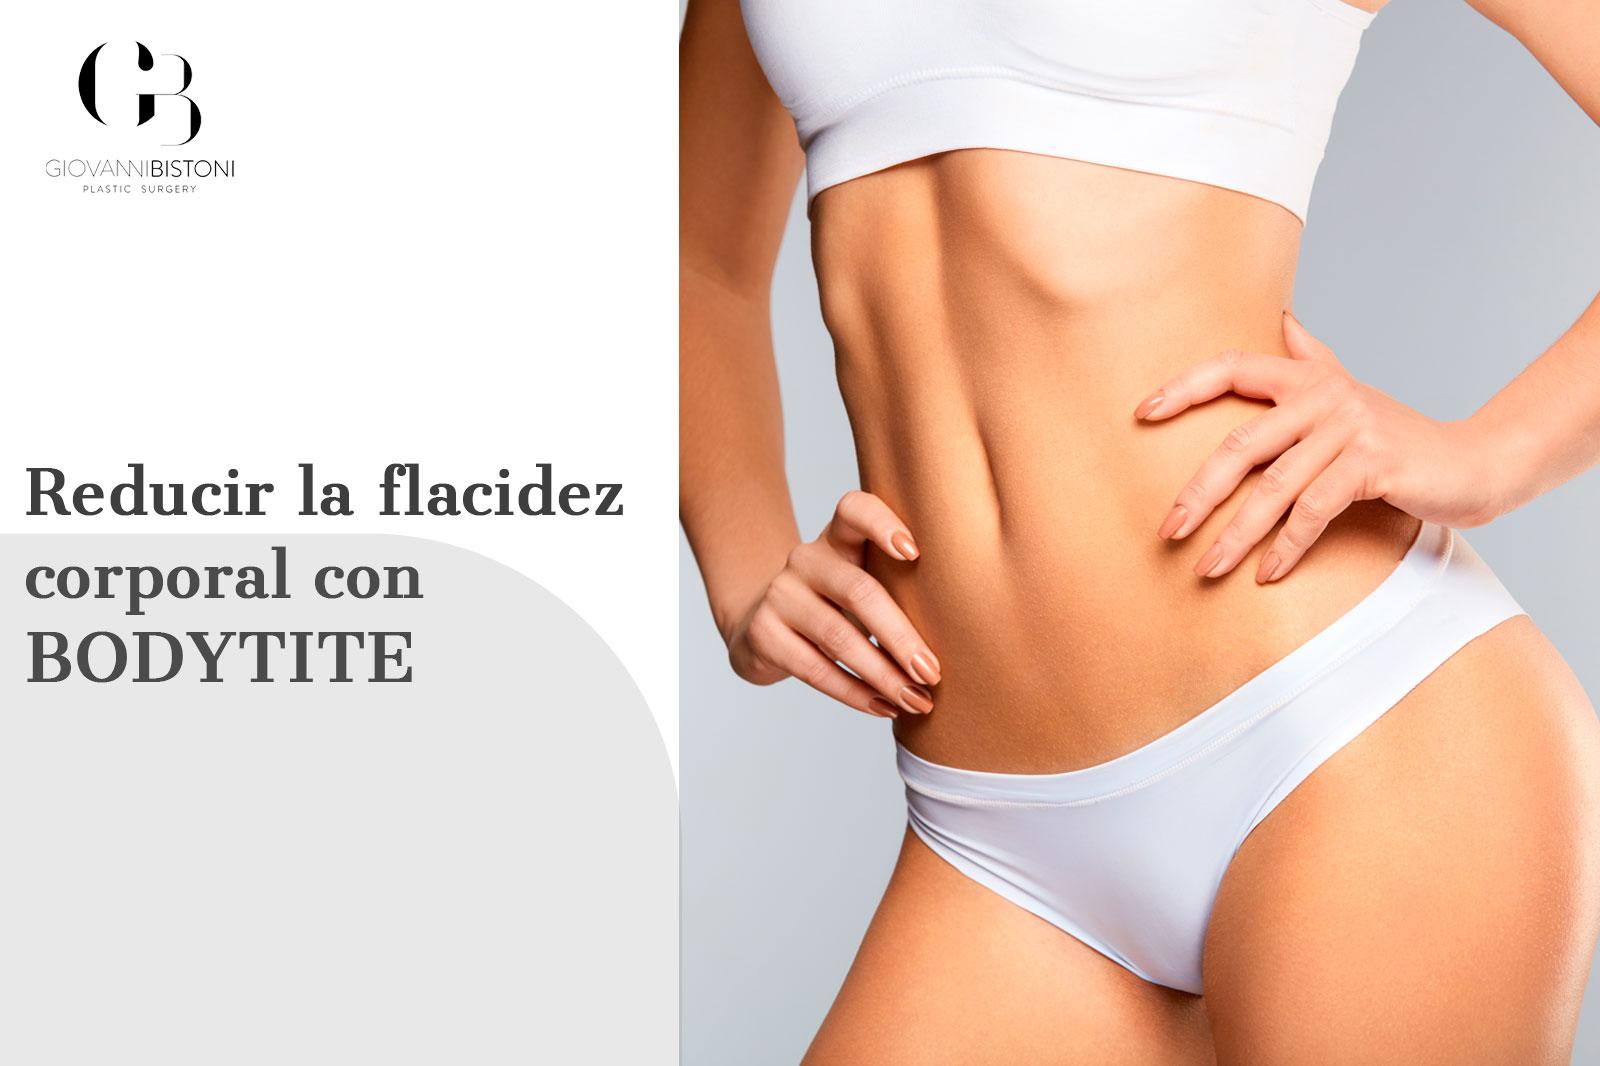 reducir la flacidez corporal con bodytite